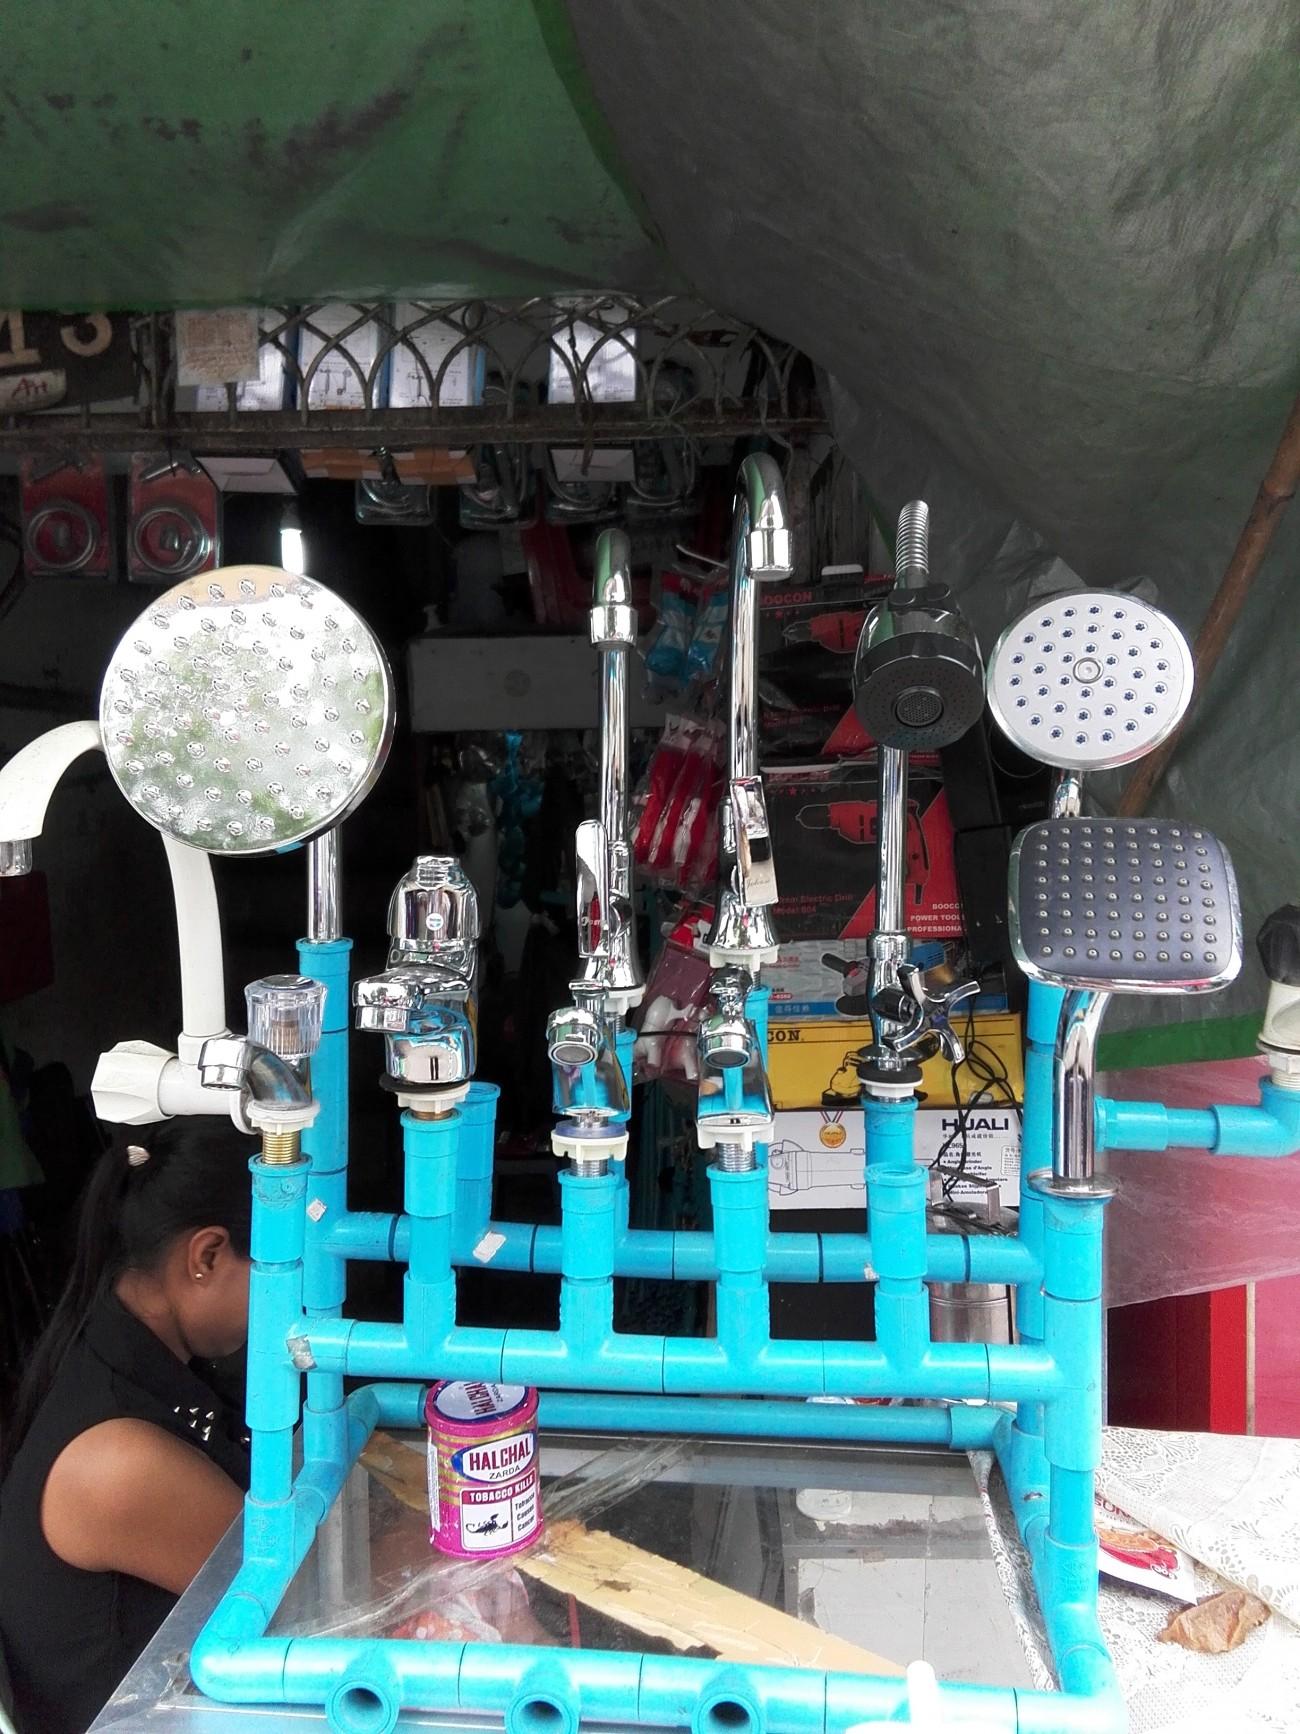 Steve Giasson. Performance invisible n° 7 (Ajouter une pincée de sel dans la mer). Performeur : Nyein Way. Rangoun, Birmanie. 12 août 2015.